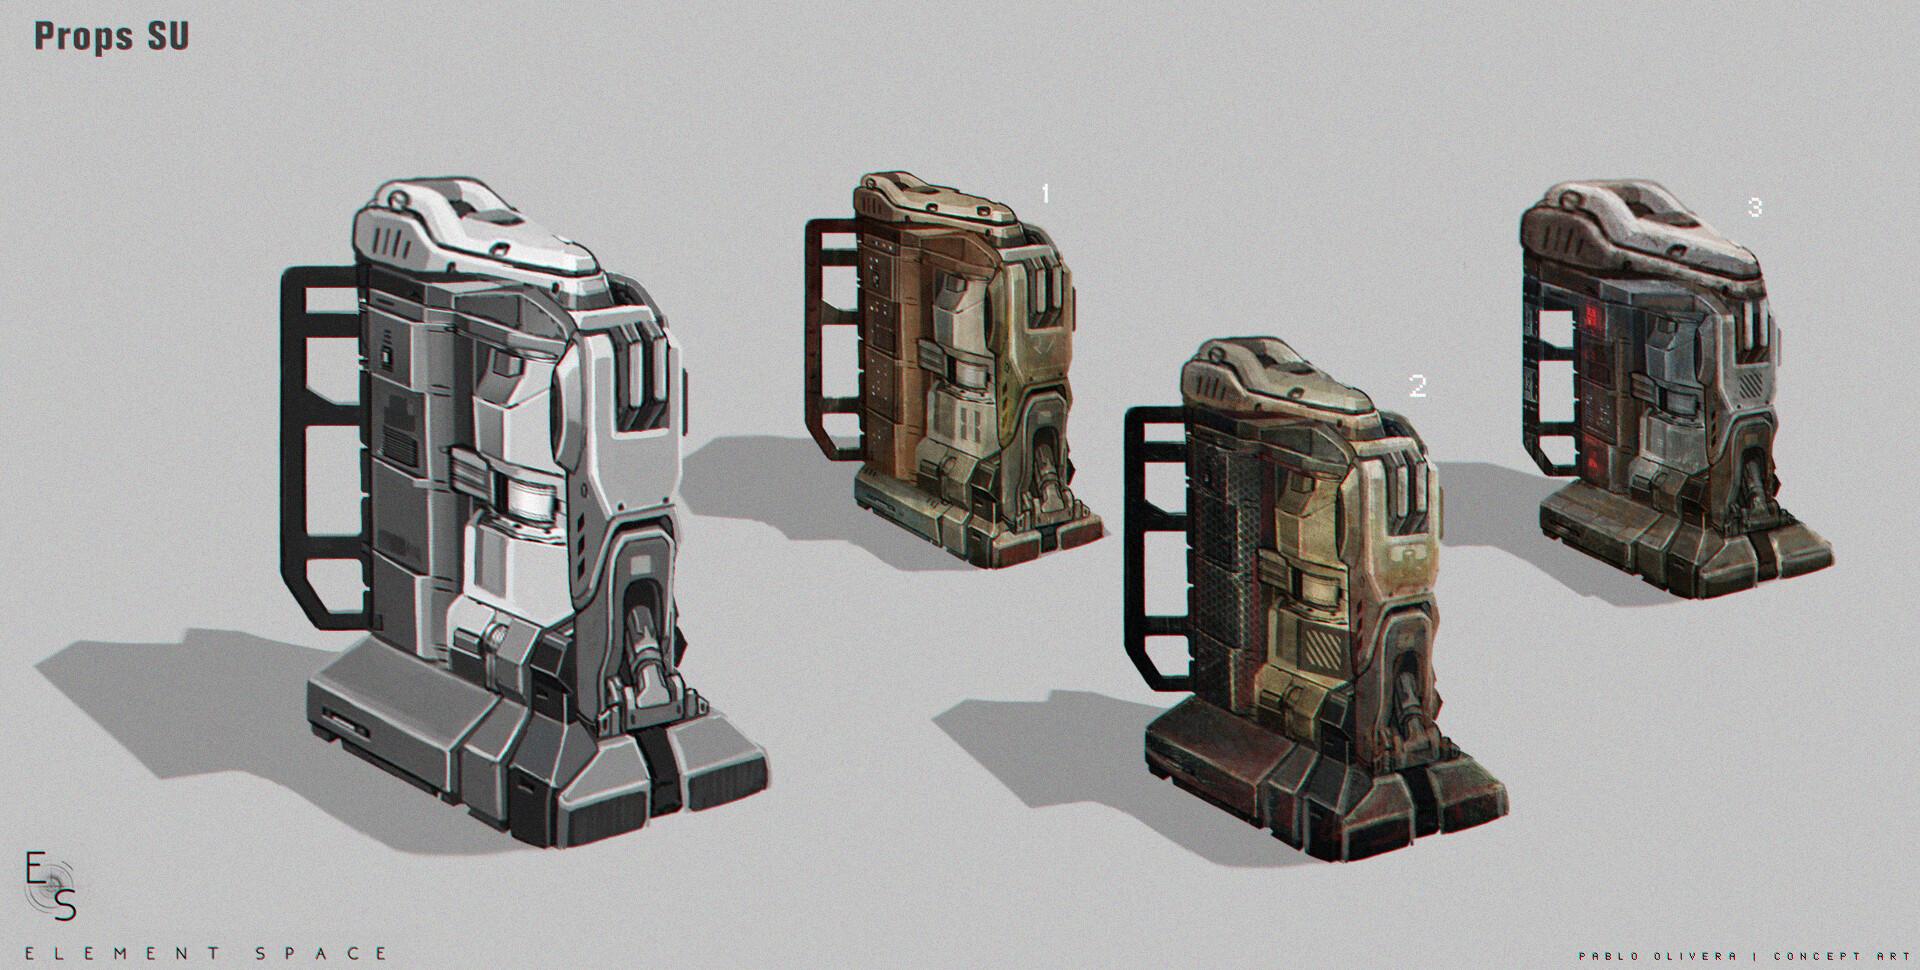 Pablo olivera element space props su machine 01